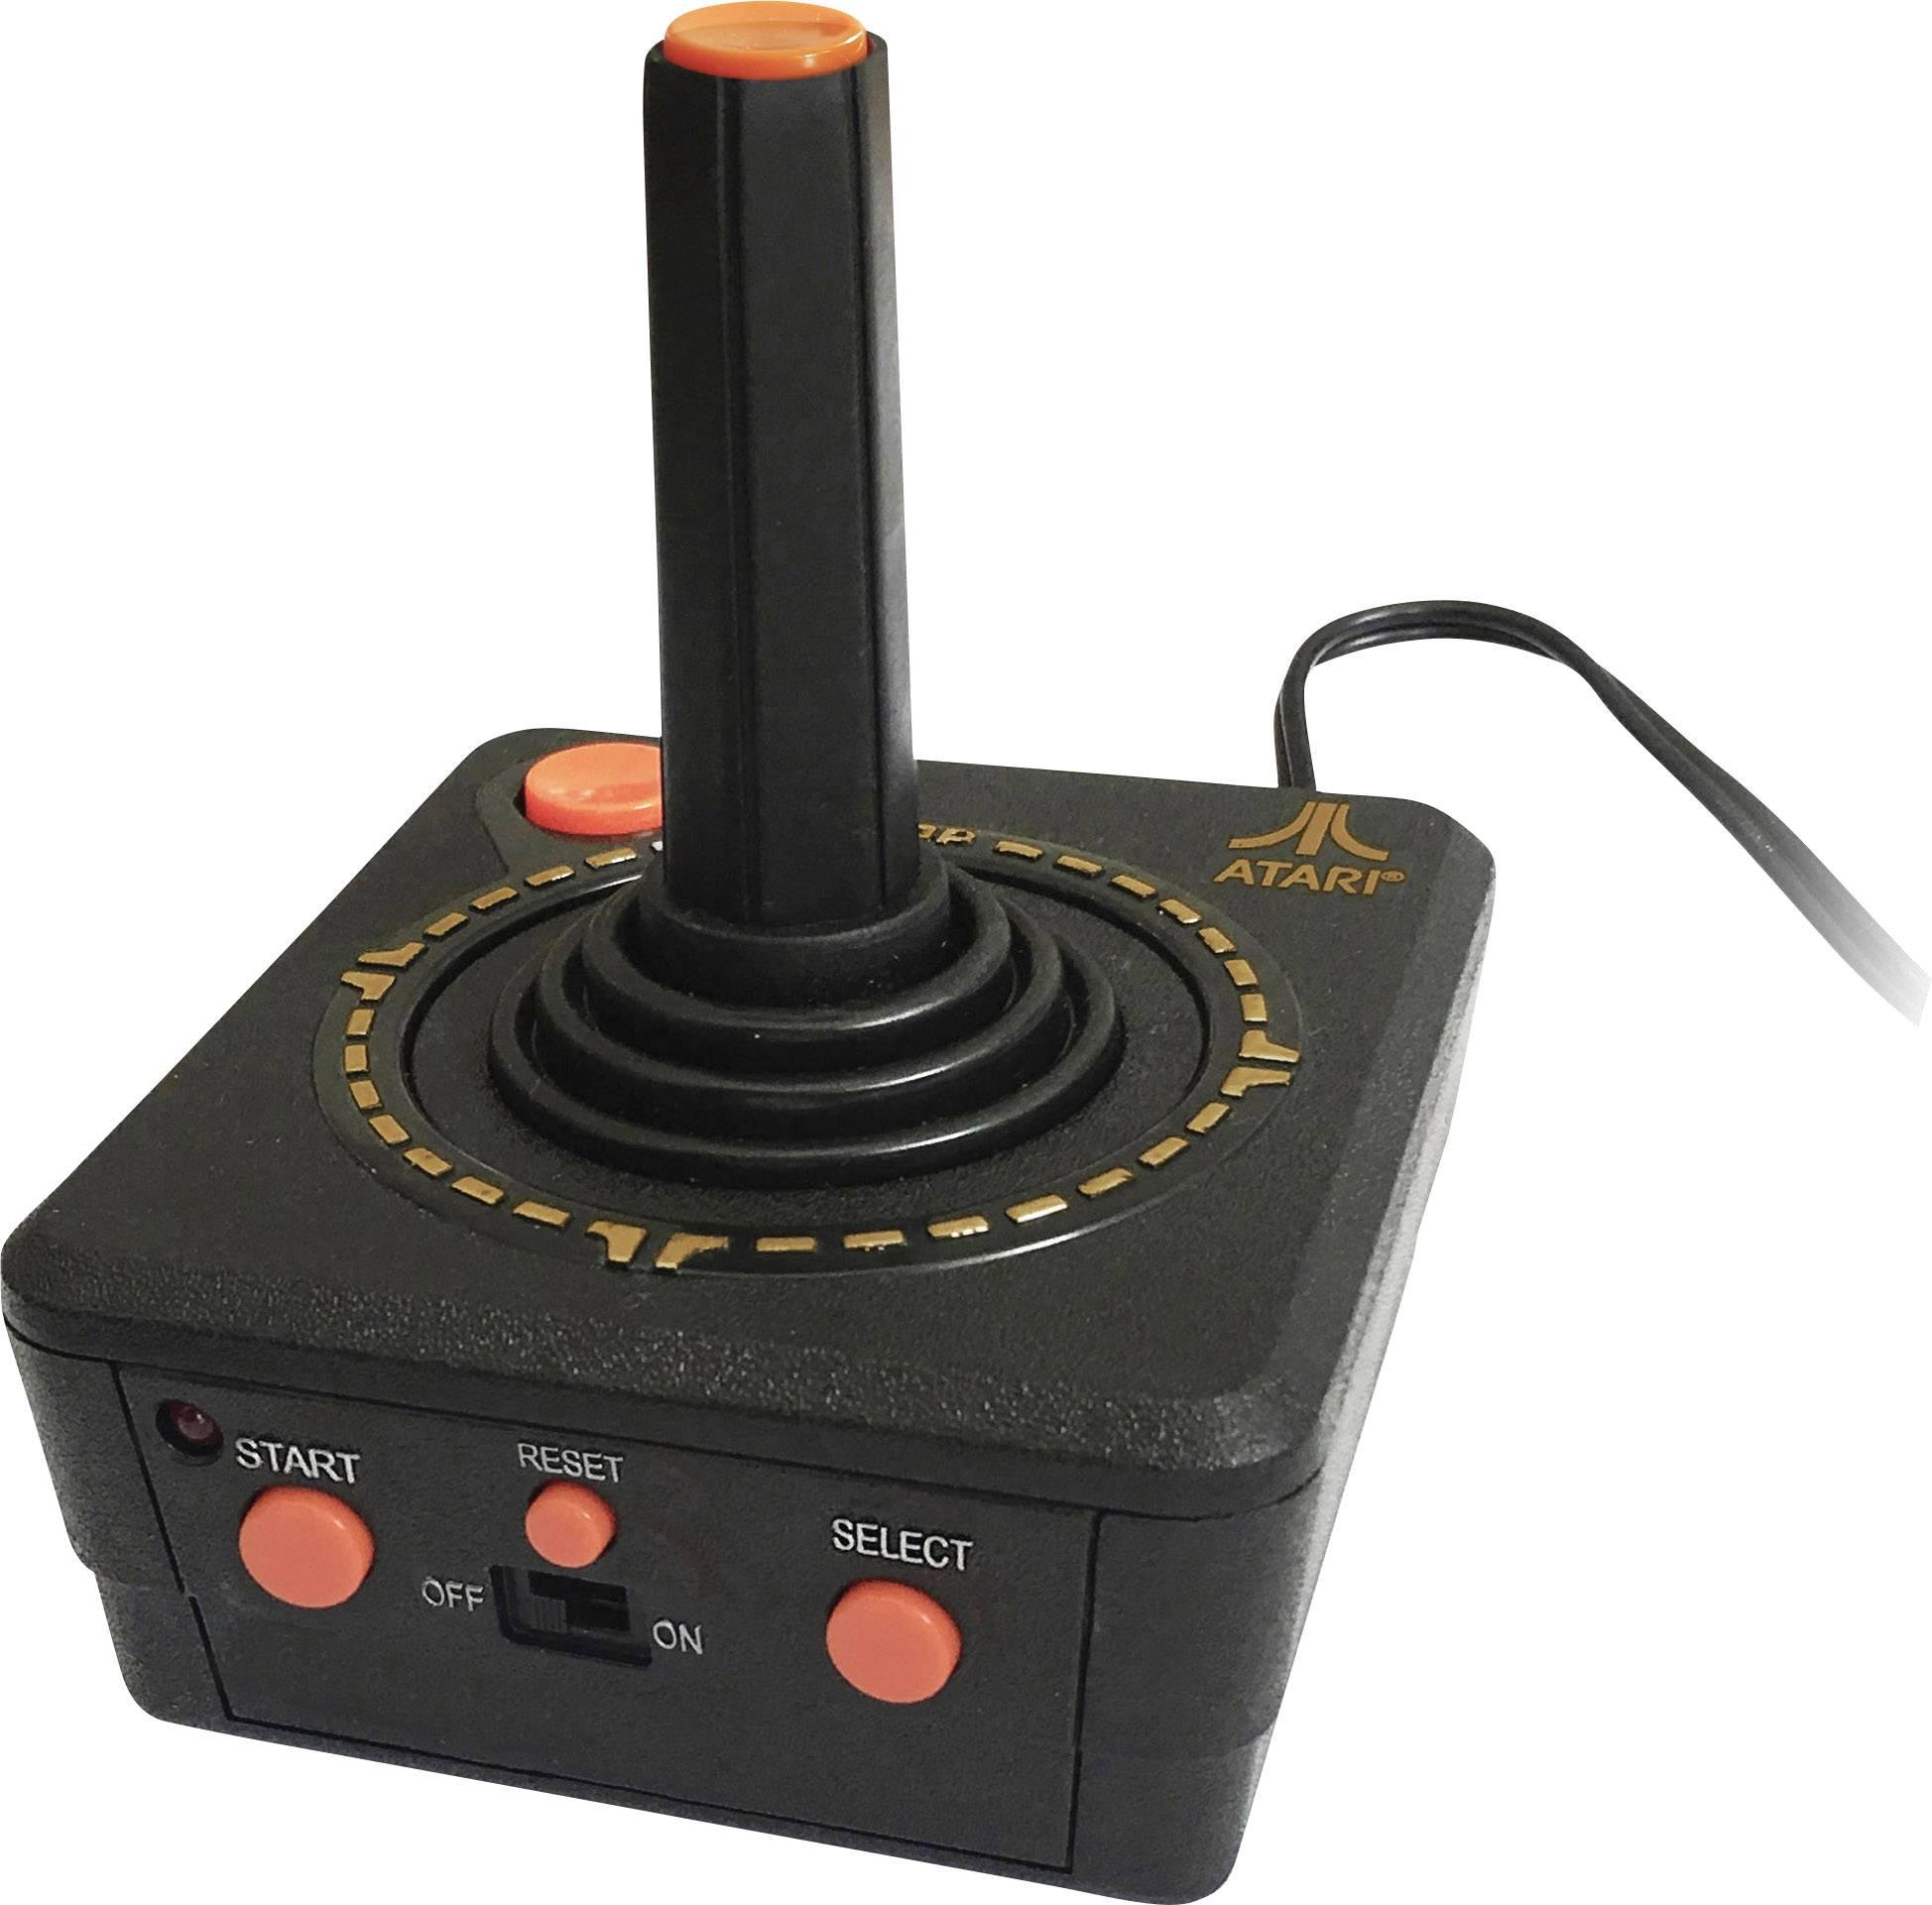 Retro herná konzola Atari TV Joystick FG-BATV-CON-E